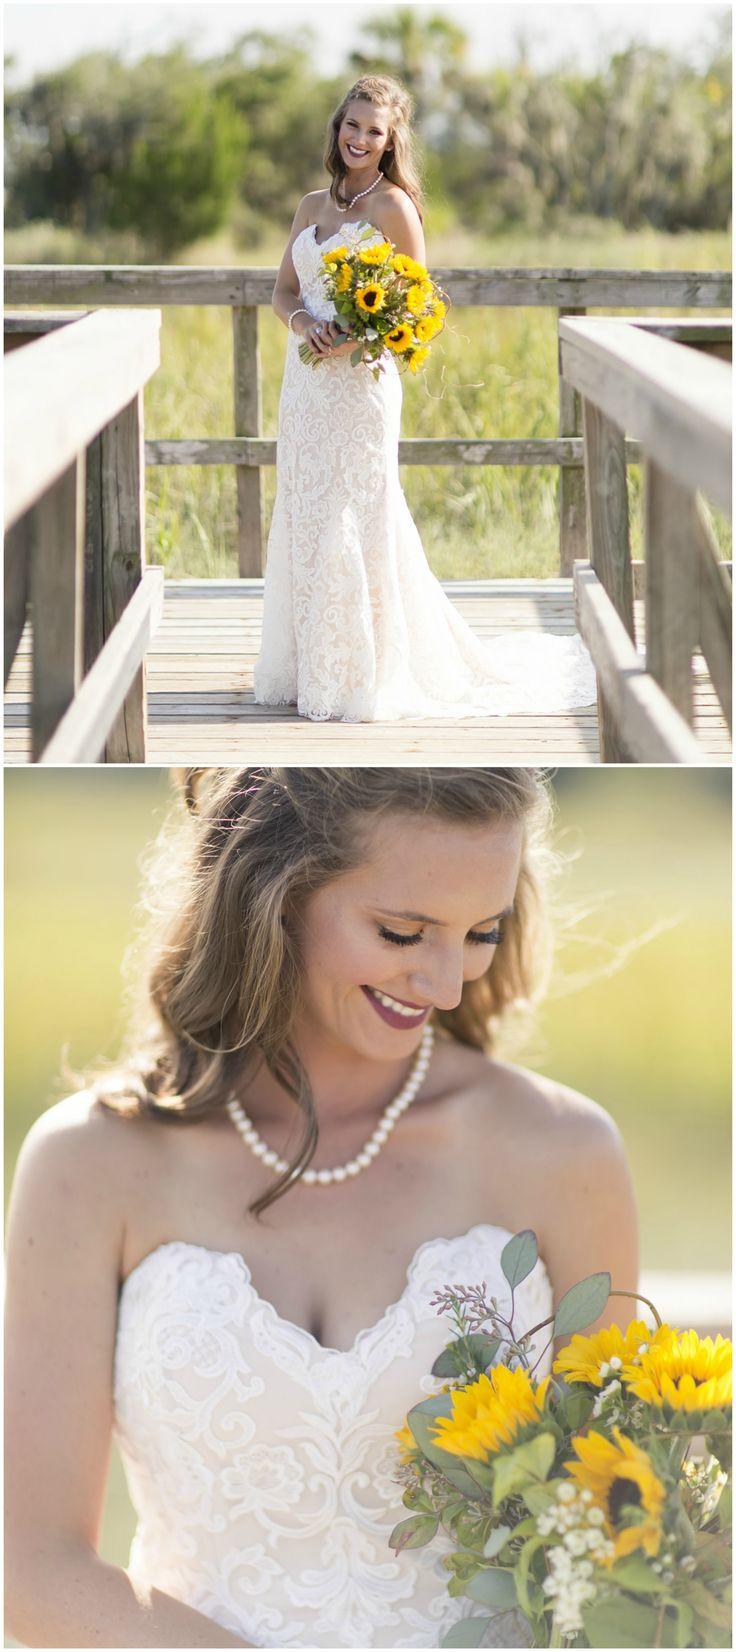 Lace wedding dress, strapless, dip neckline, sunflower bouquet, bridal fashion by Impression Bridal // Laura Watson Photography